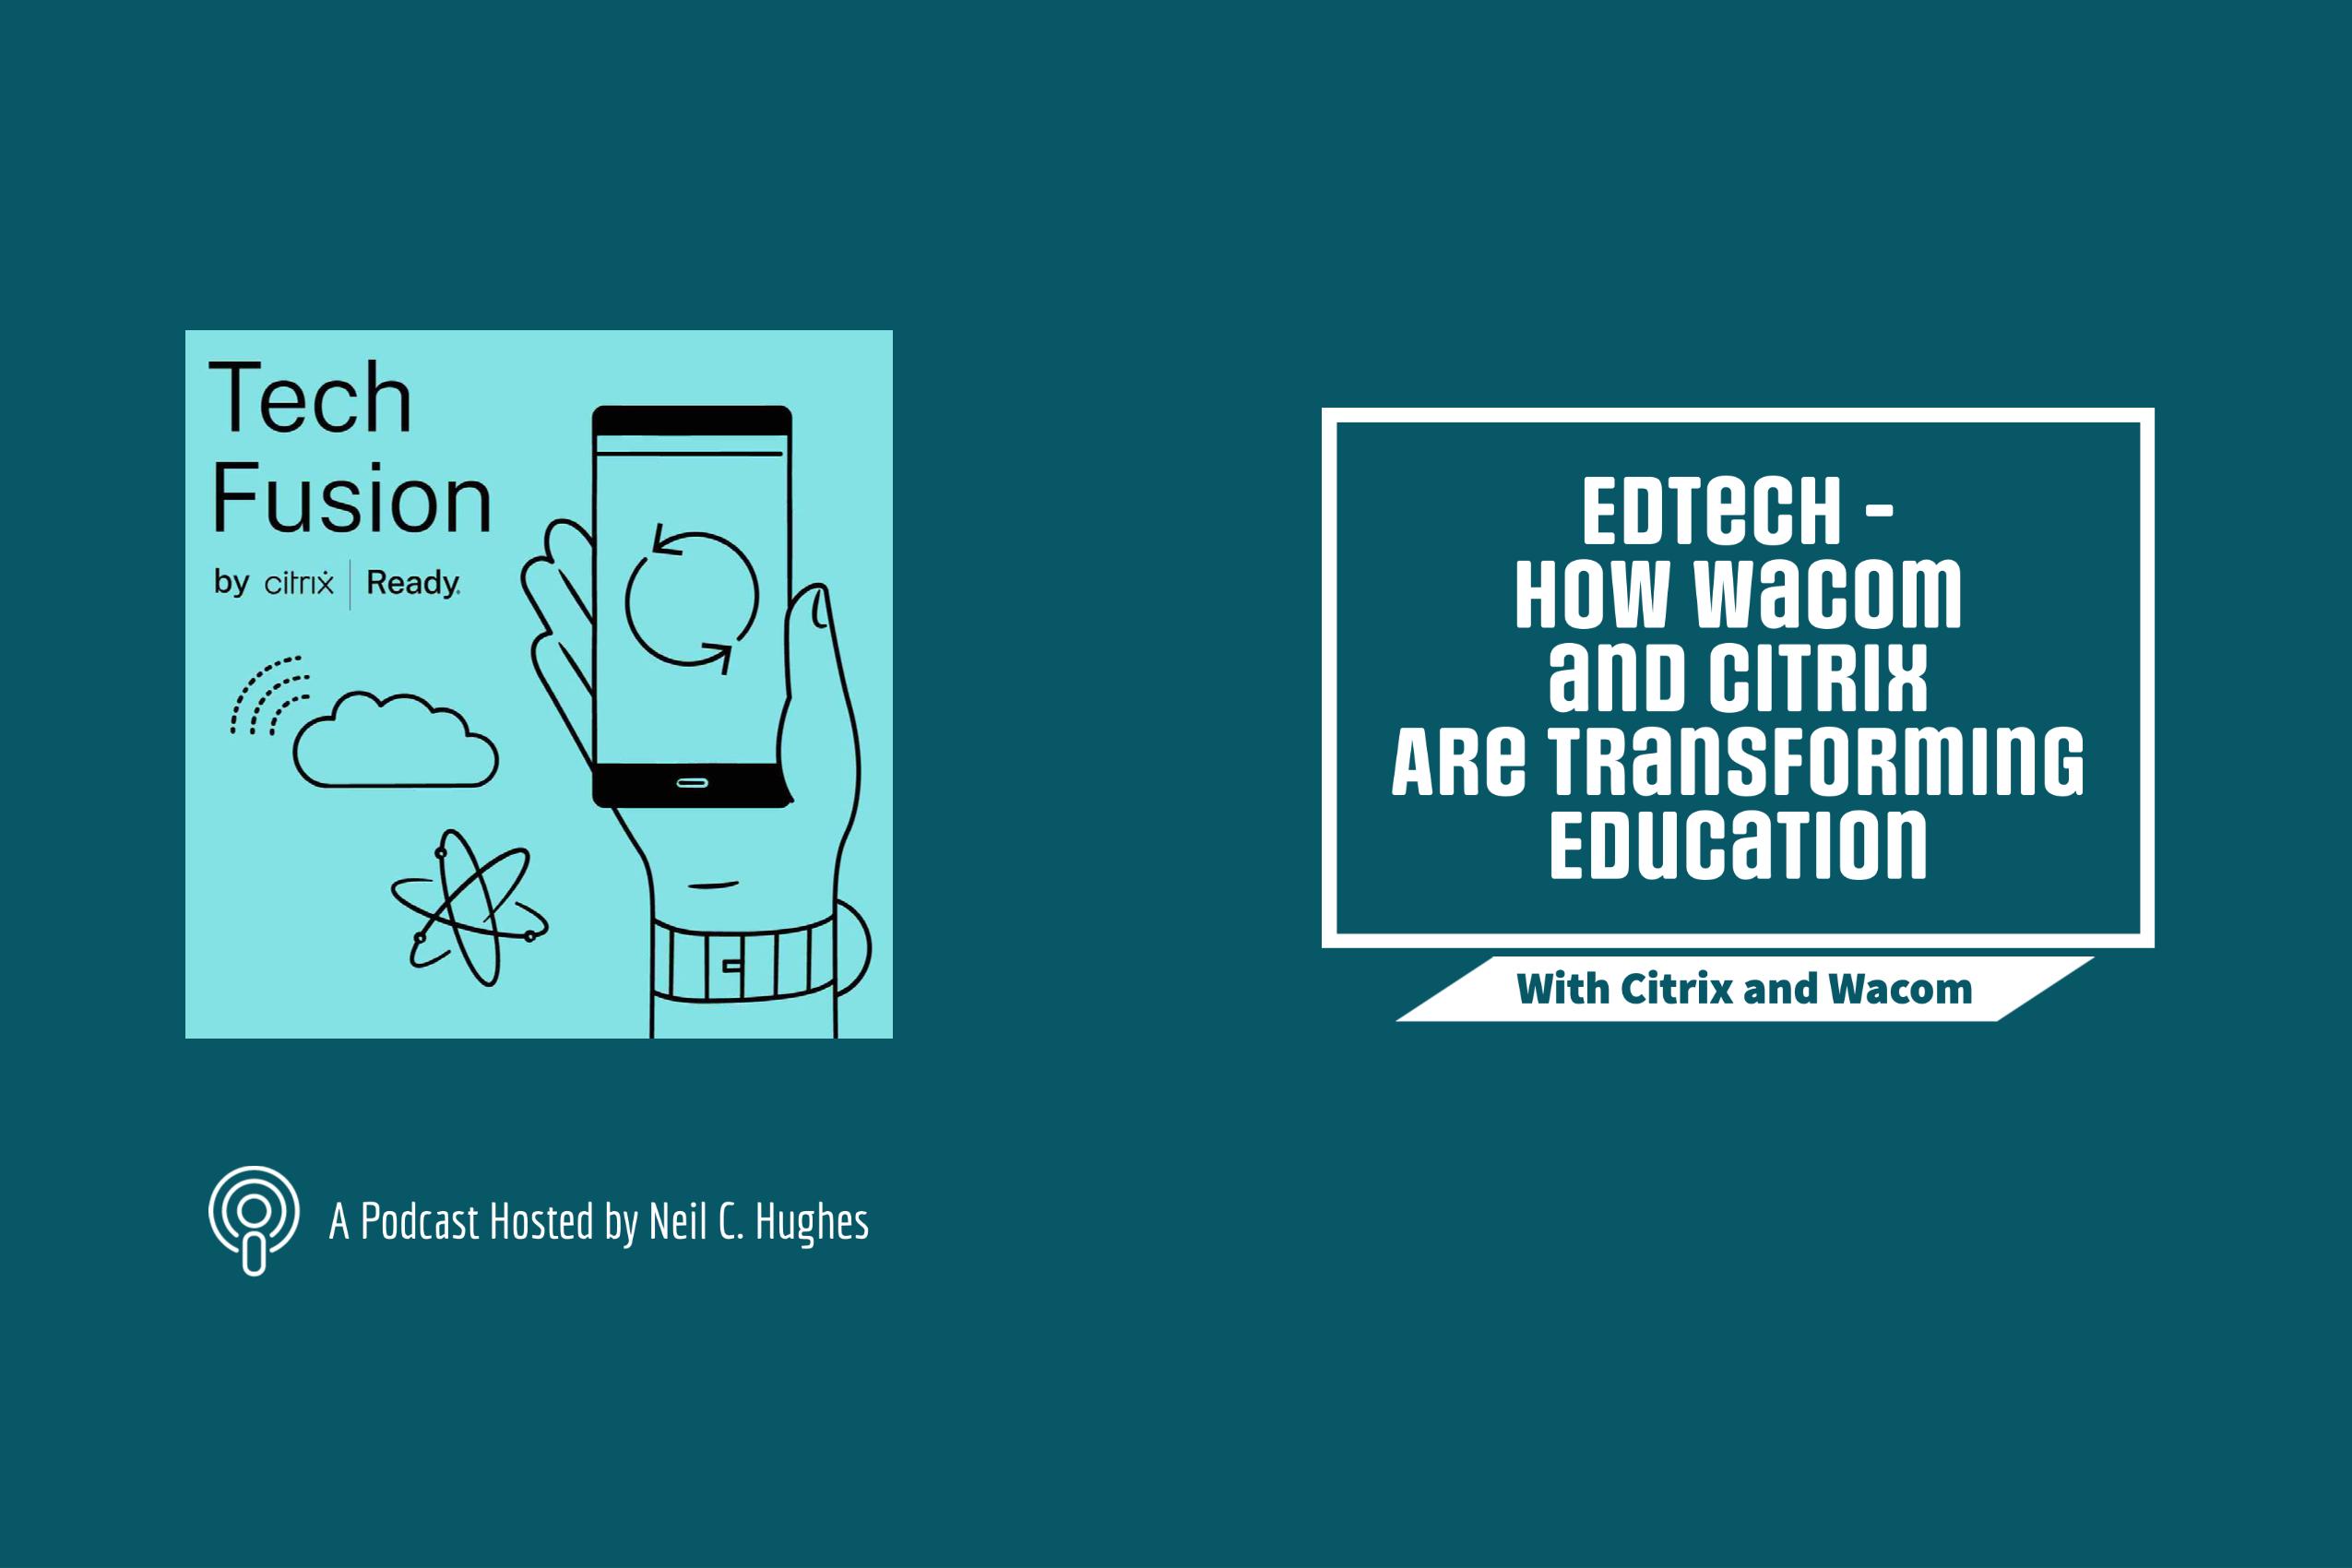 EdTech – How Wacom and Citrix Are Transforming Education